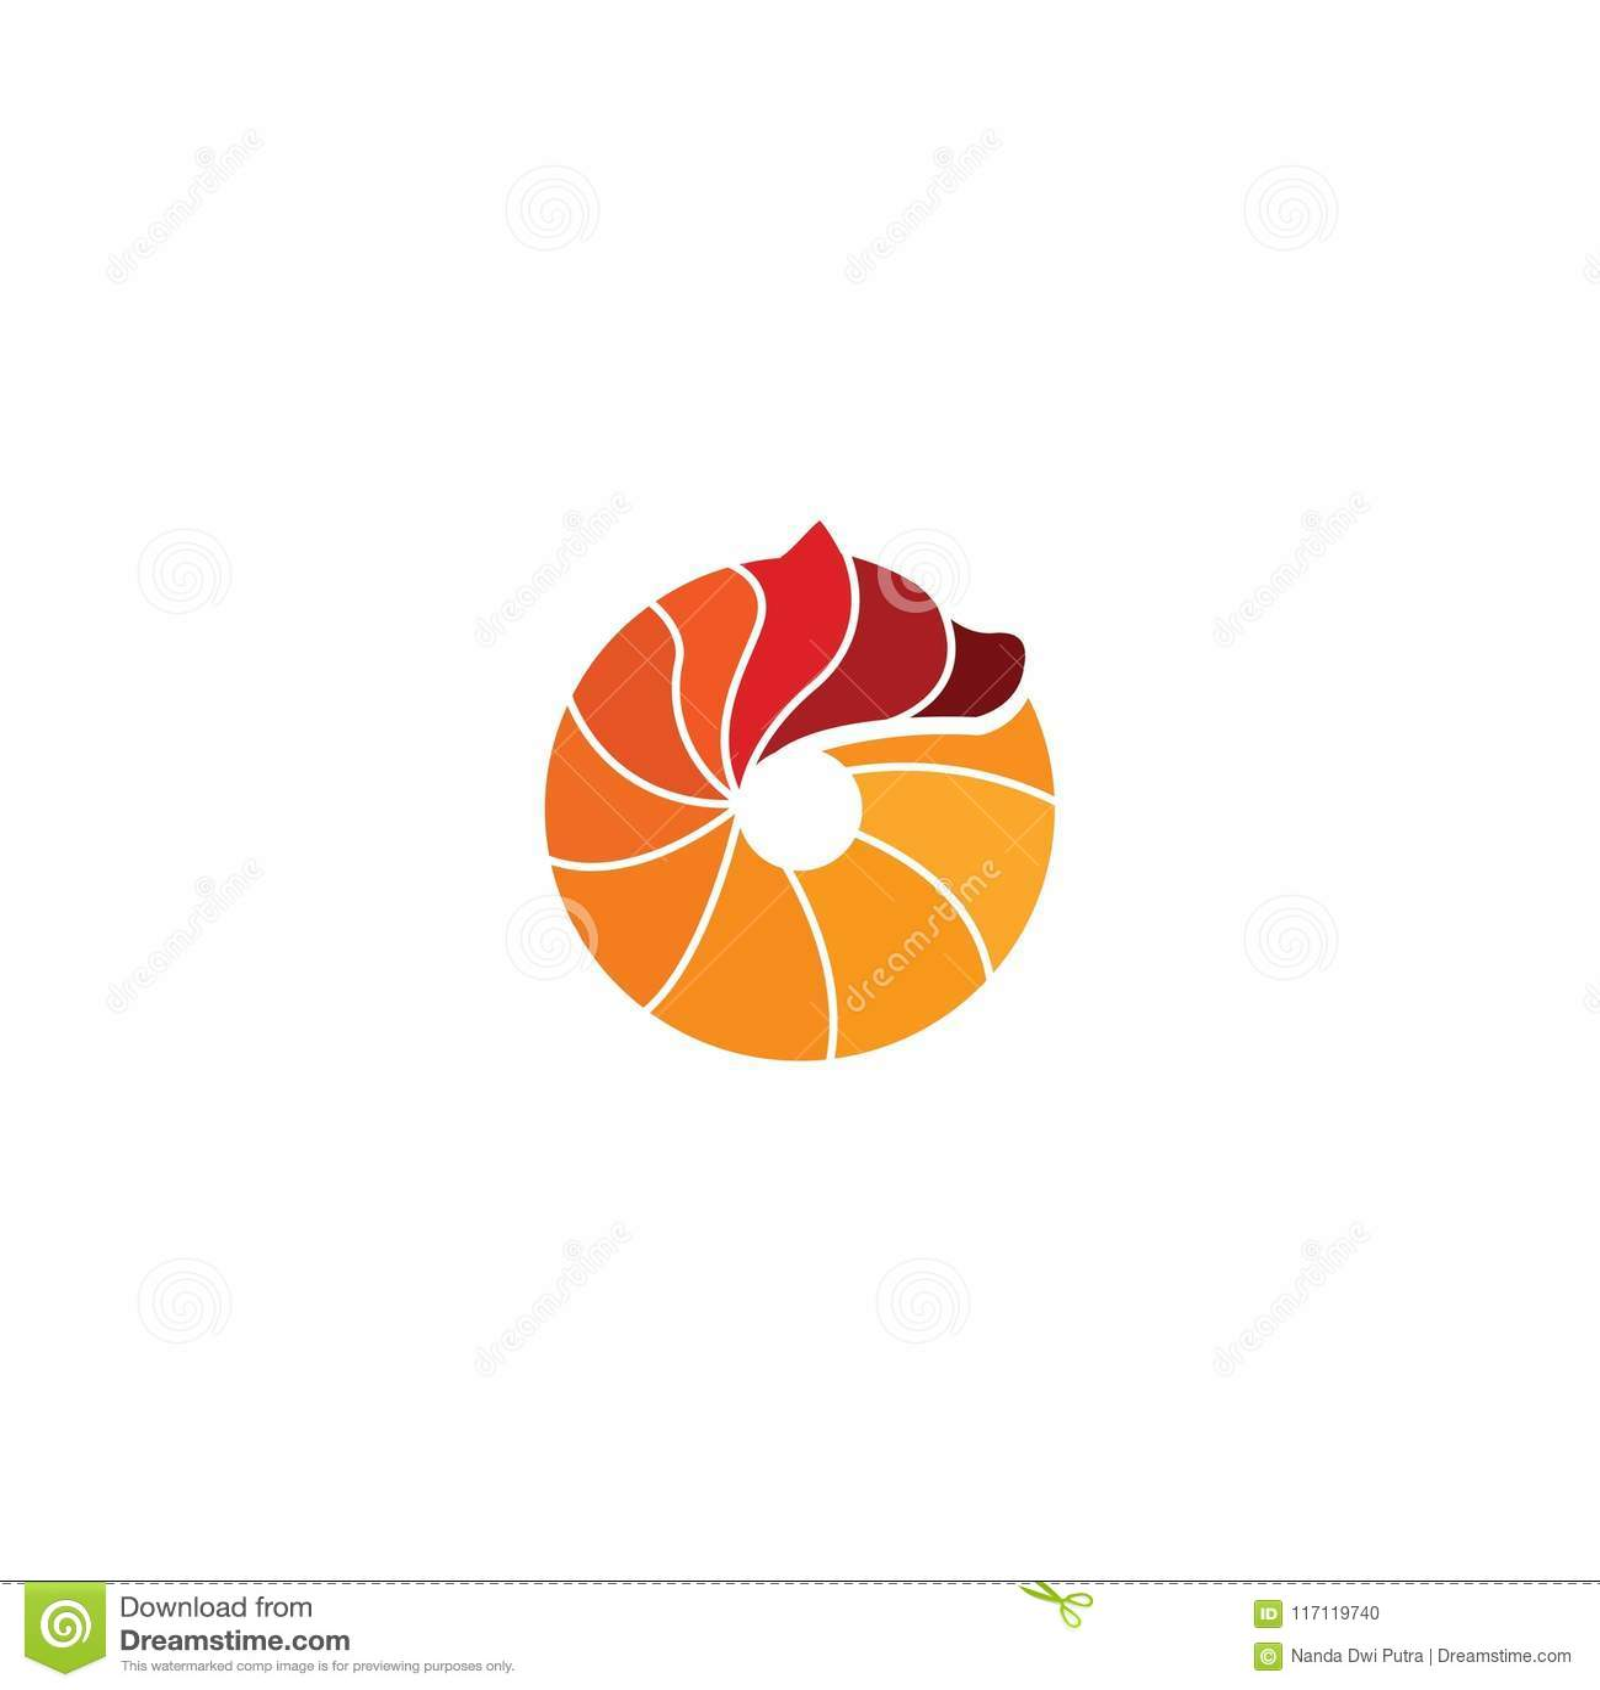 Circle bear logo design with simple concept